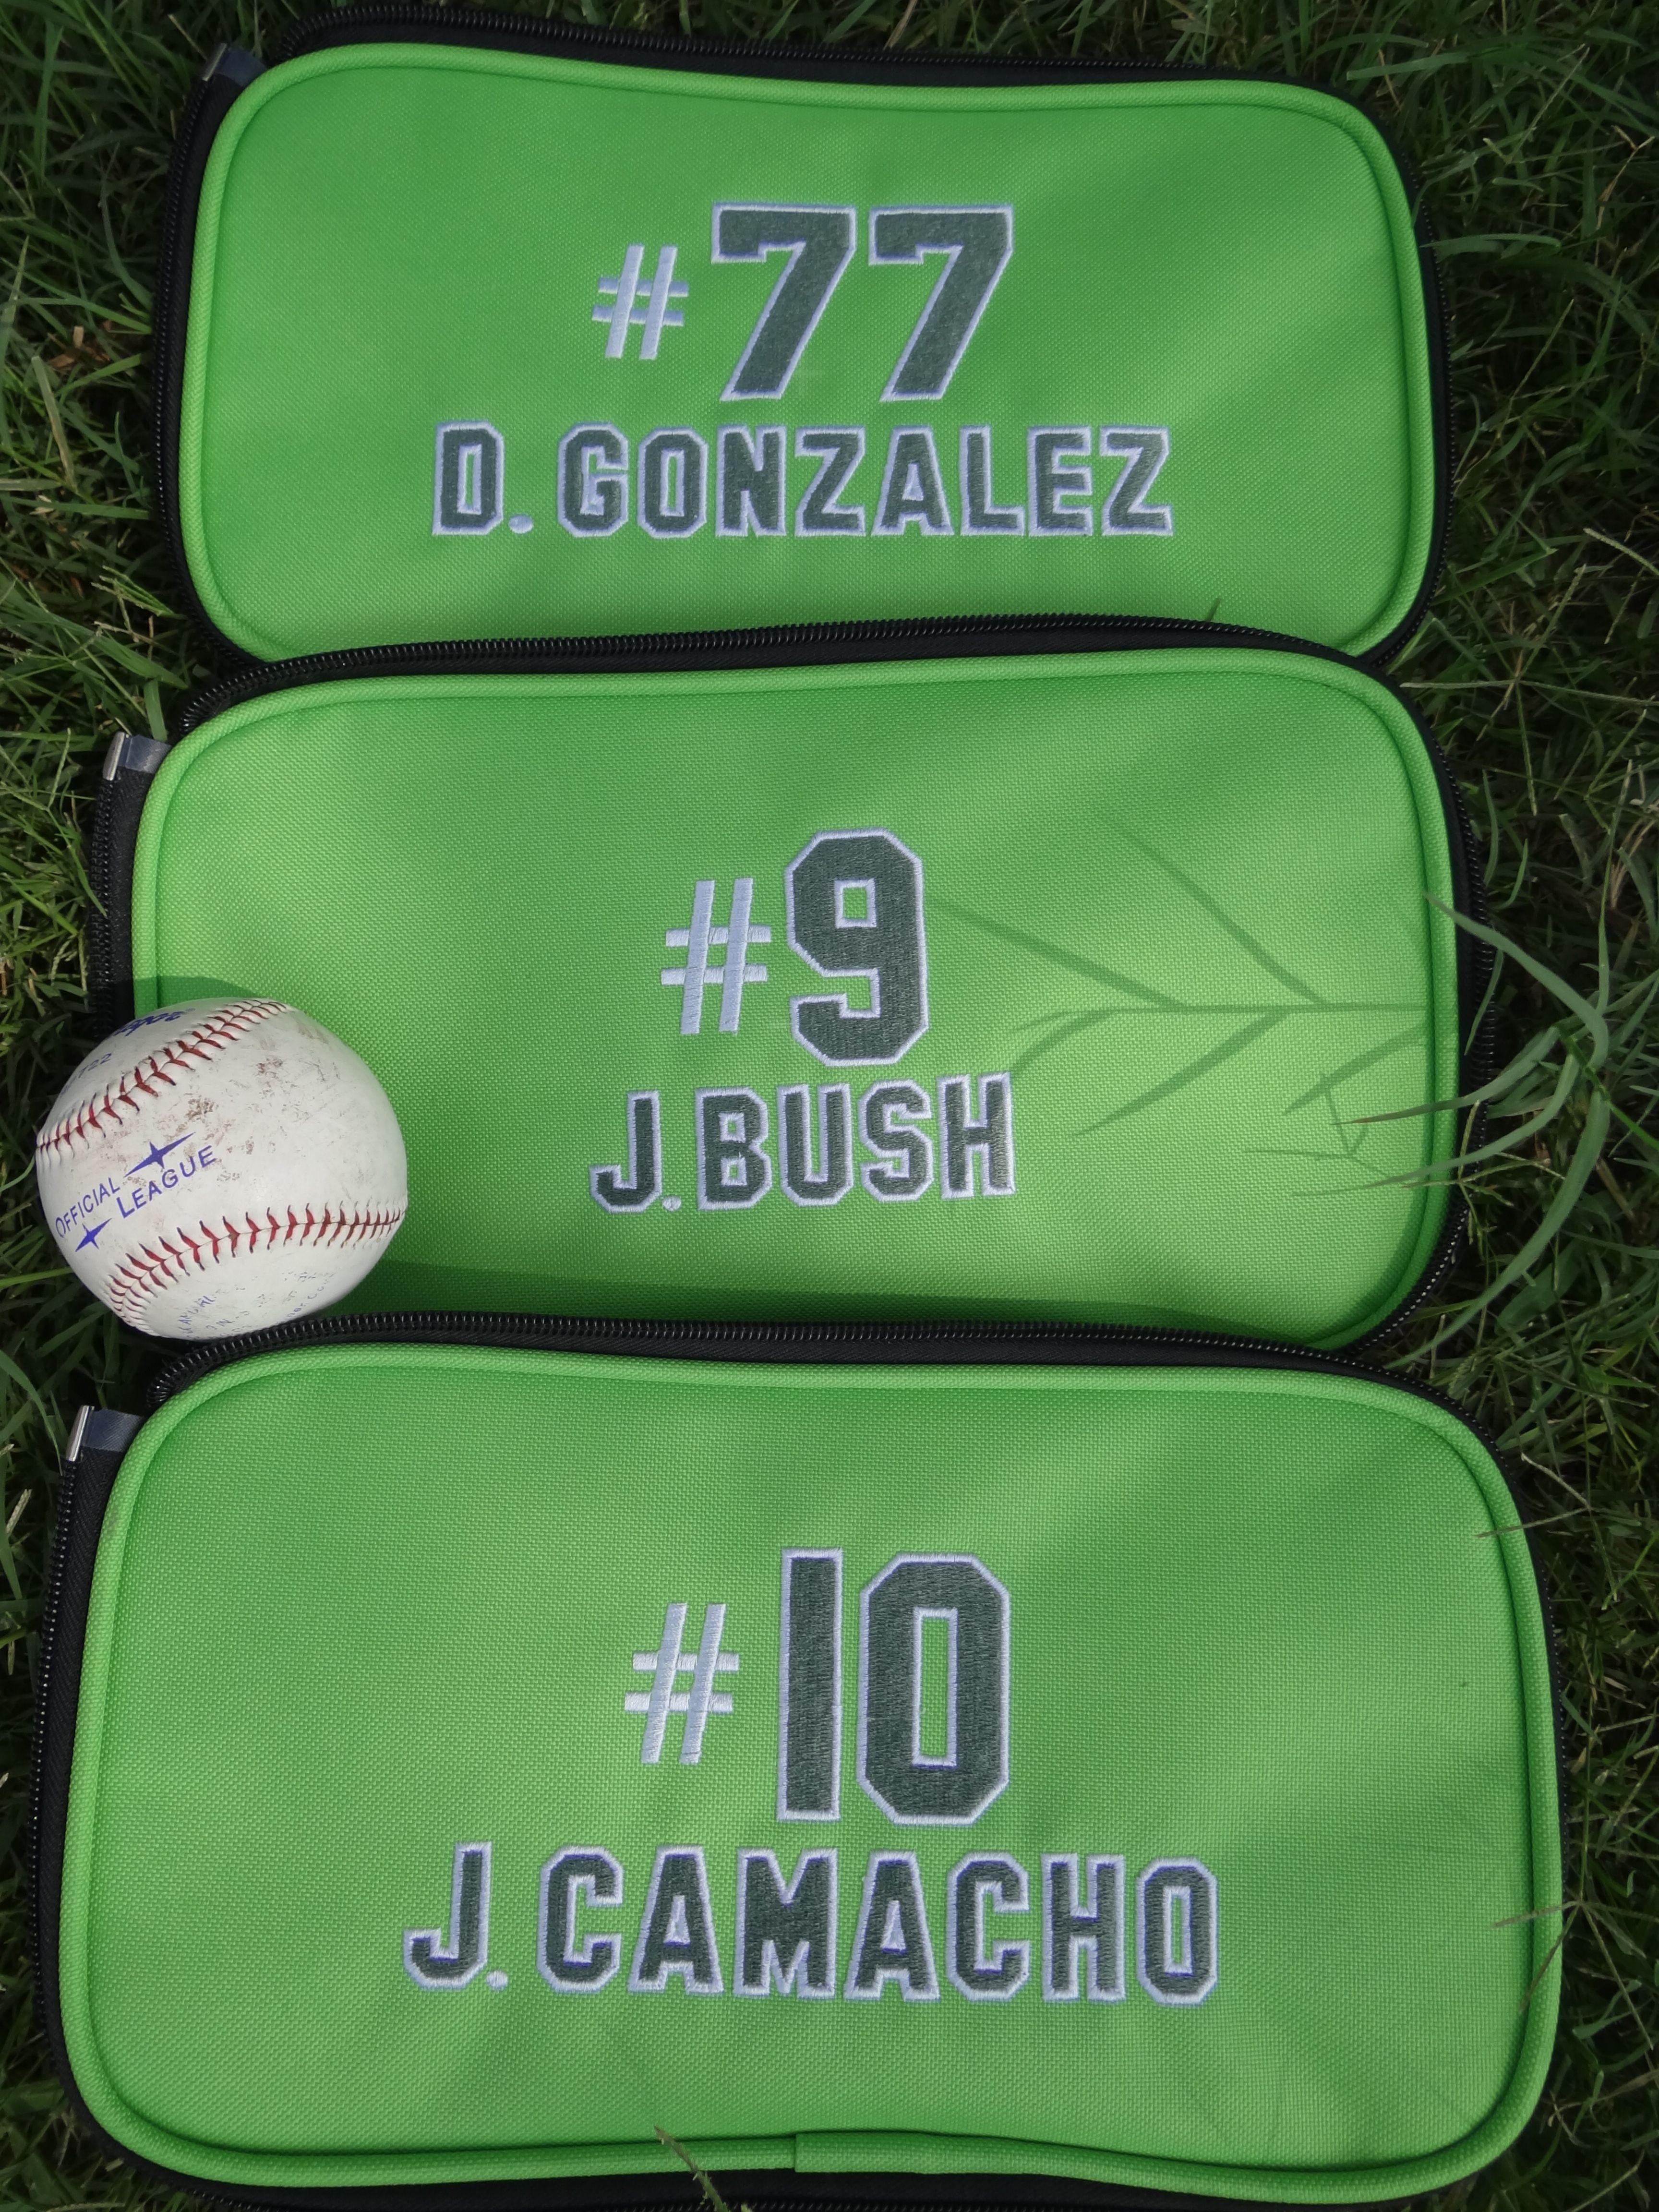 Personalized Bat Bag Attachments With Collegiate Lettering It S Baseball Season Corpus Christi Texas Custo Baseball Bag Collegiate Lettering Usa Baseball